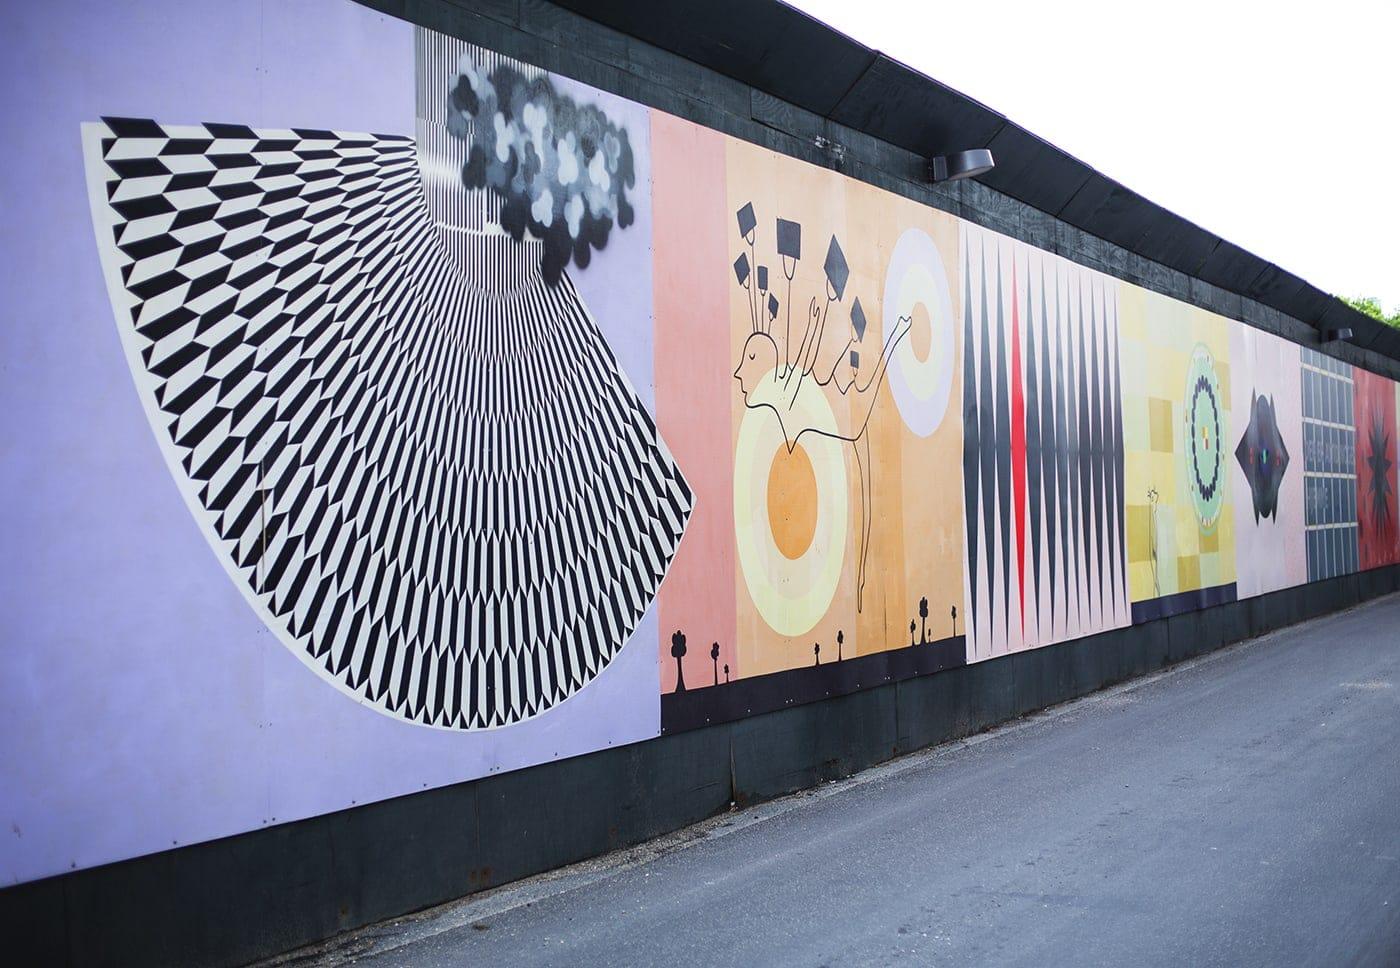 copenhagen-wanderlust-street-art-walls